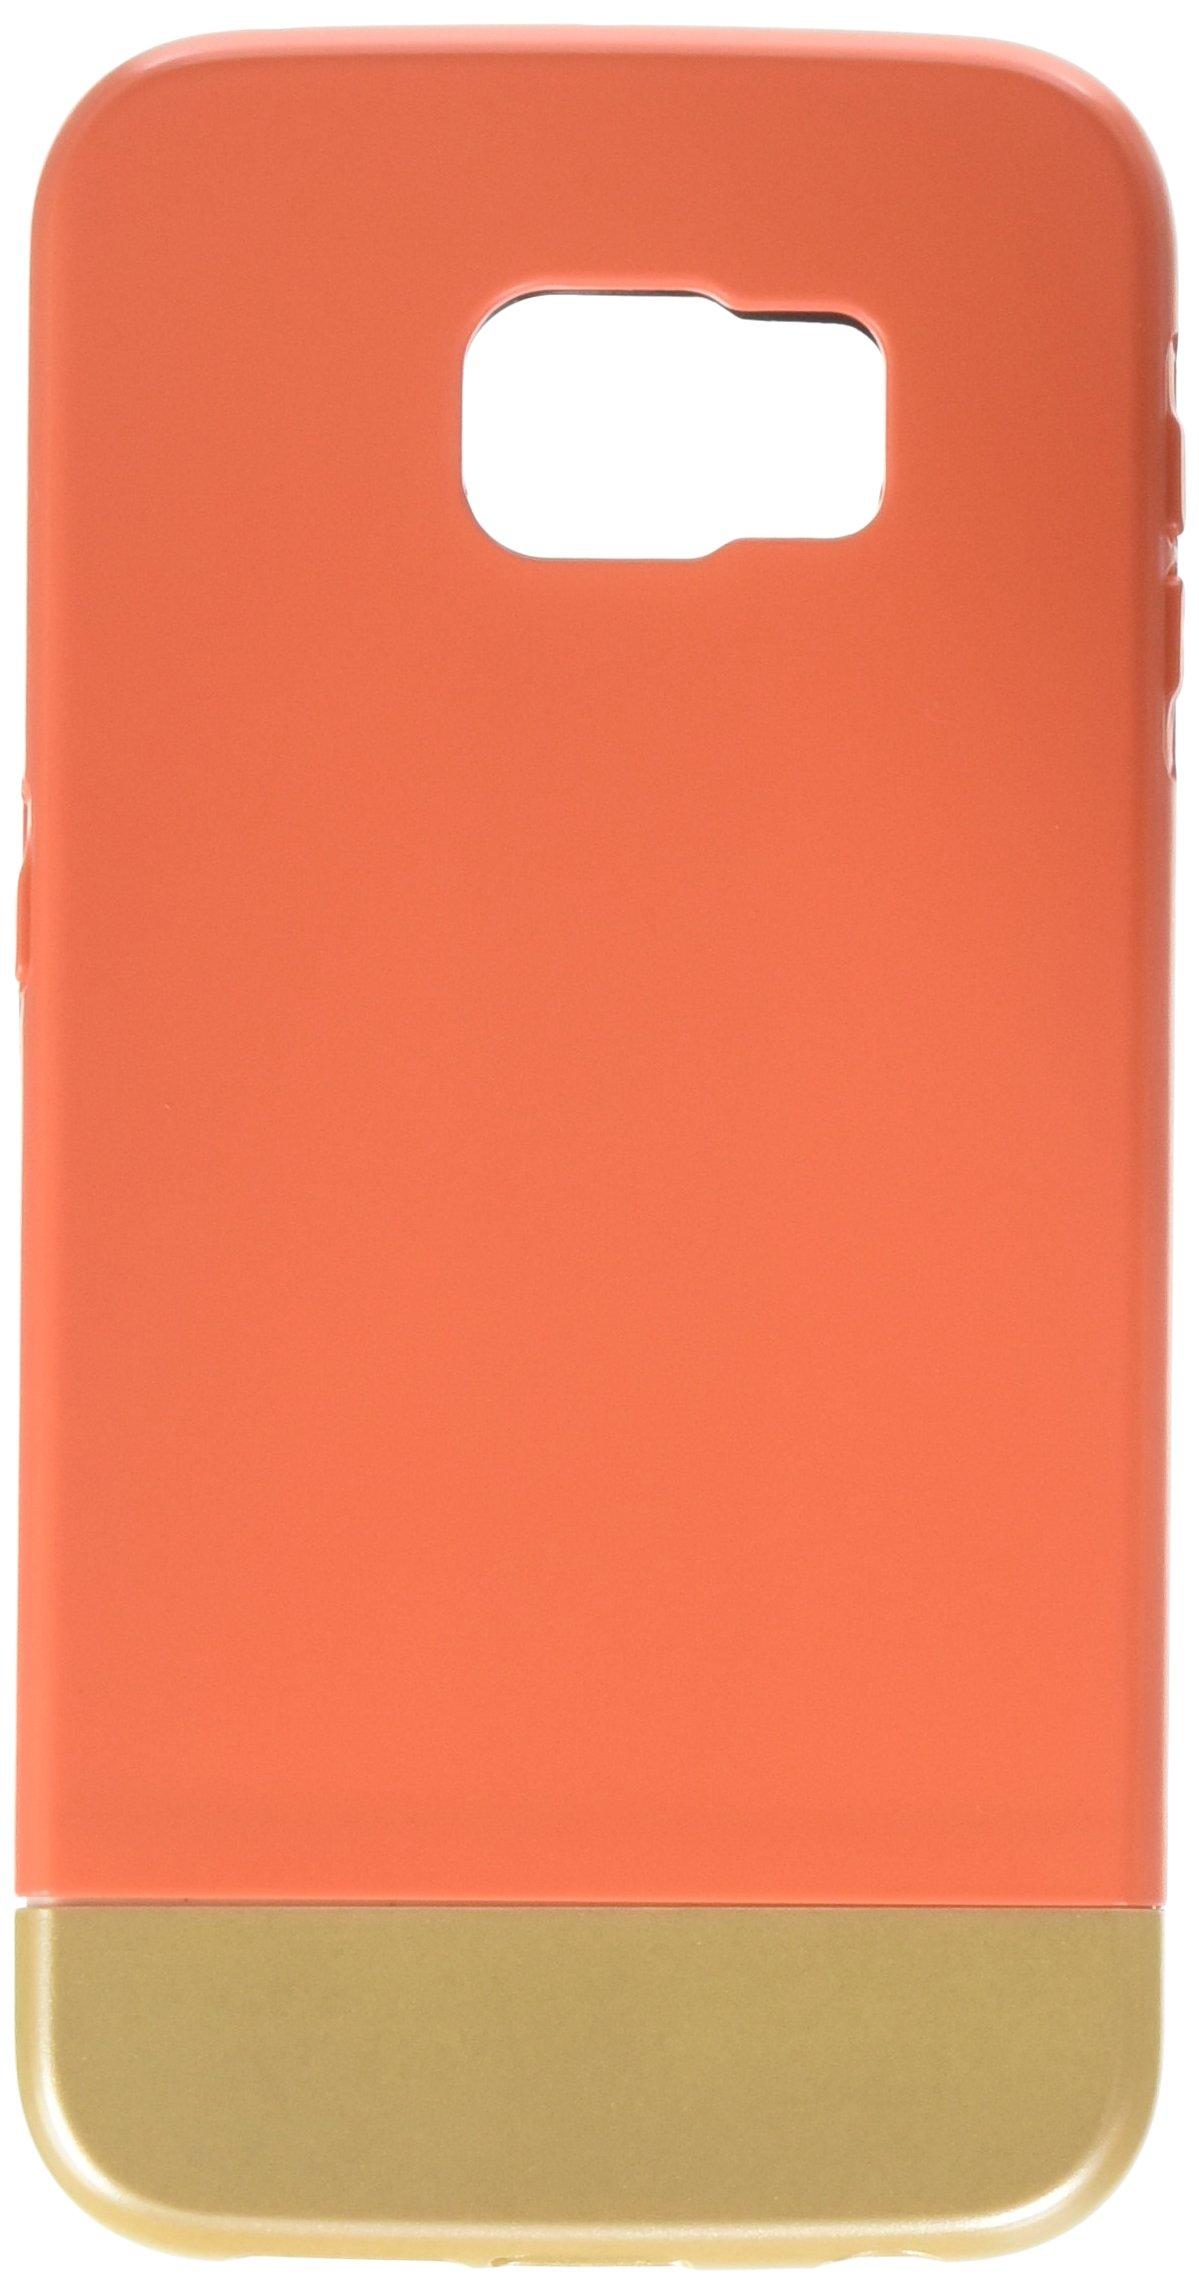 orange samsung s6 edge case amazon comgalaxy s6 edge case, ulak hybrid case with inner soft tpu and hard outer matte